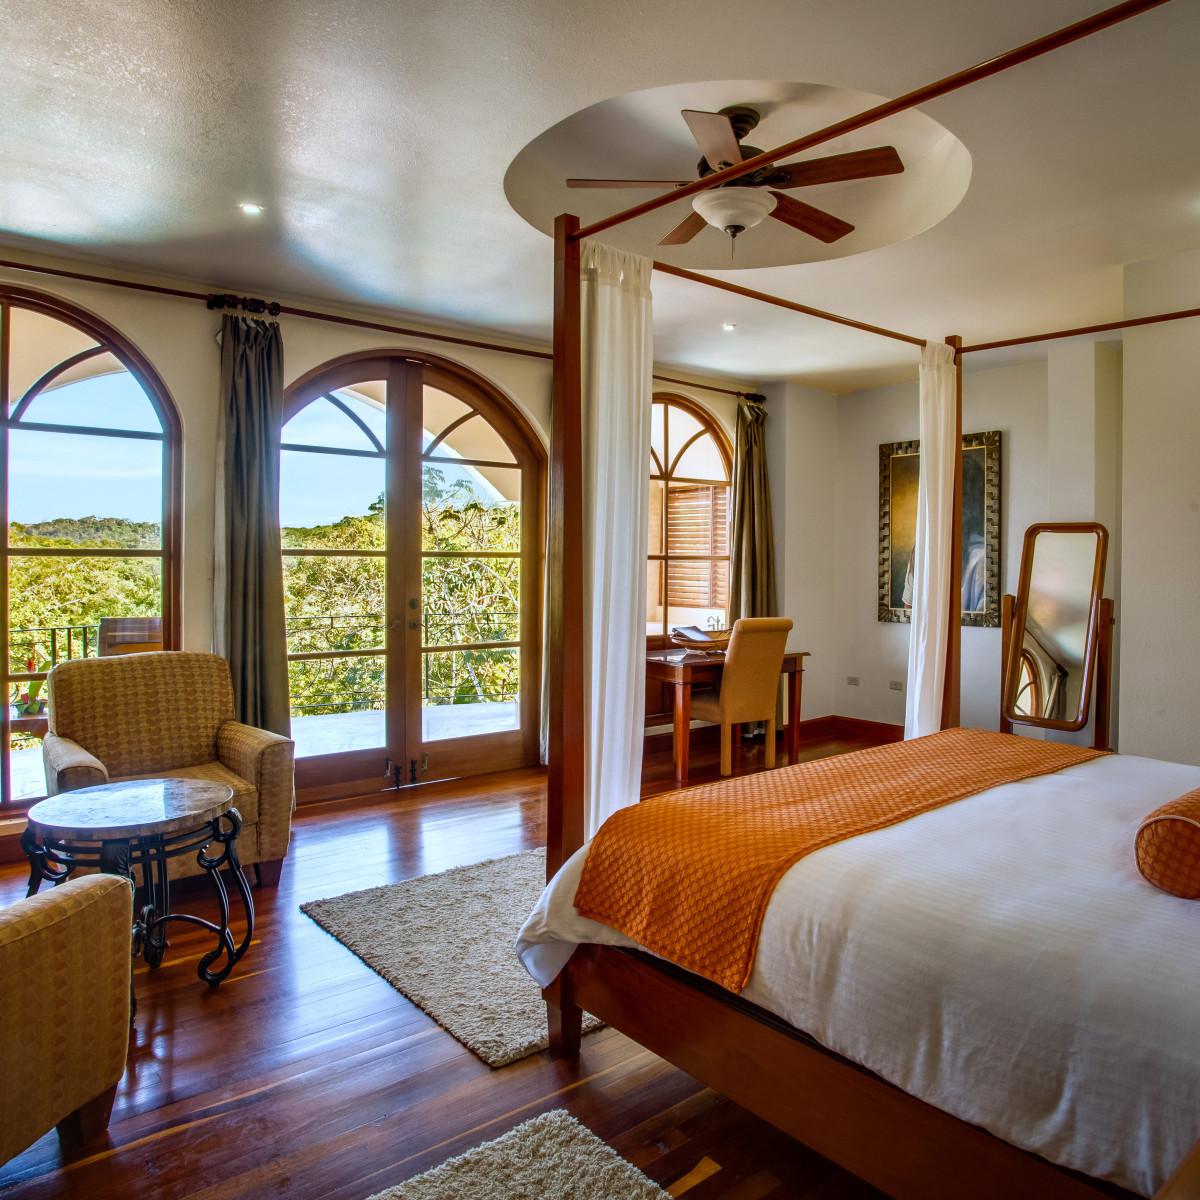 San Ignacio Resort Hotel, Belize, guest room